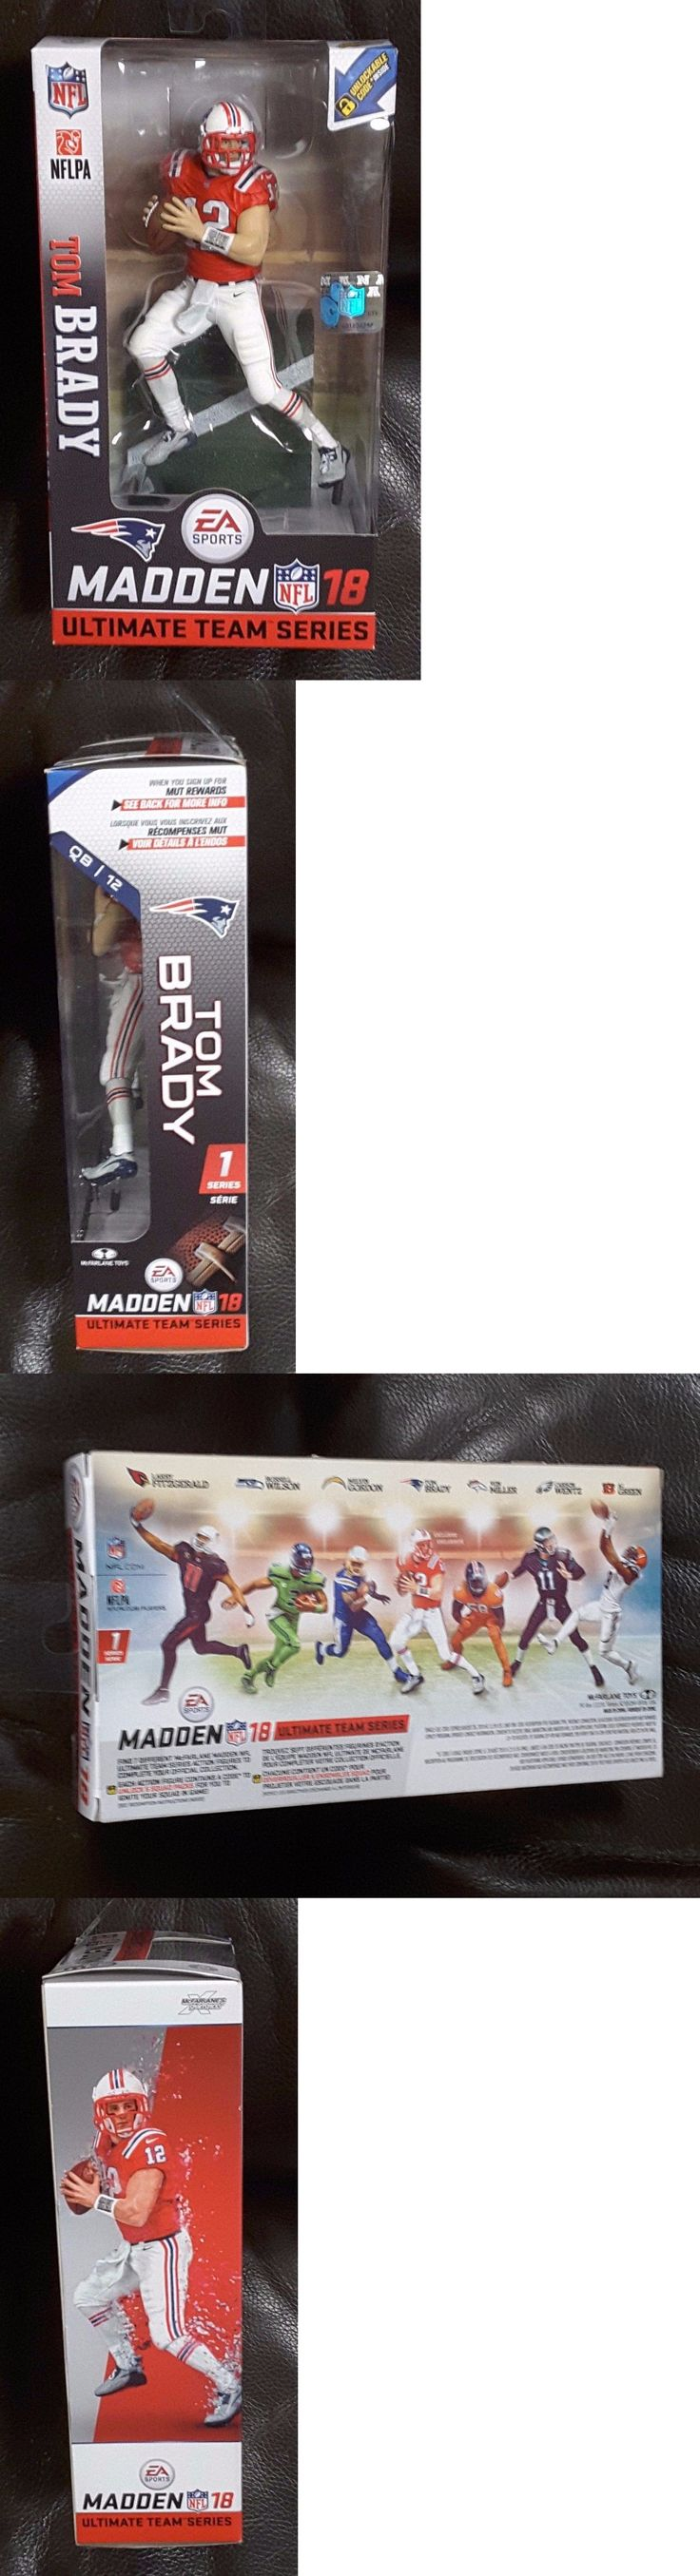 Sports 754: Tom Brady - Mcfarlane Madden 18 Ultimate Team Series 1 - Near Mint -> BUY IT NOW ONLY: $37.68 on eBay!